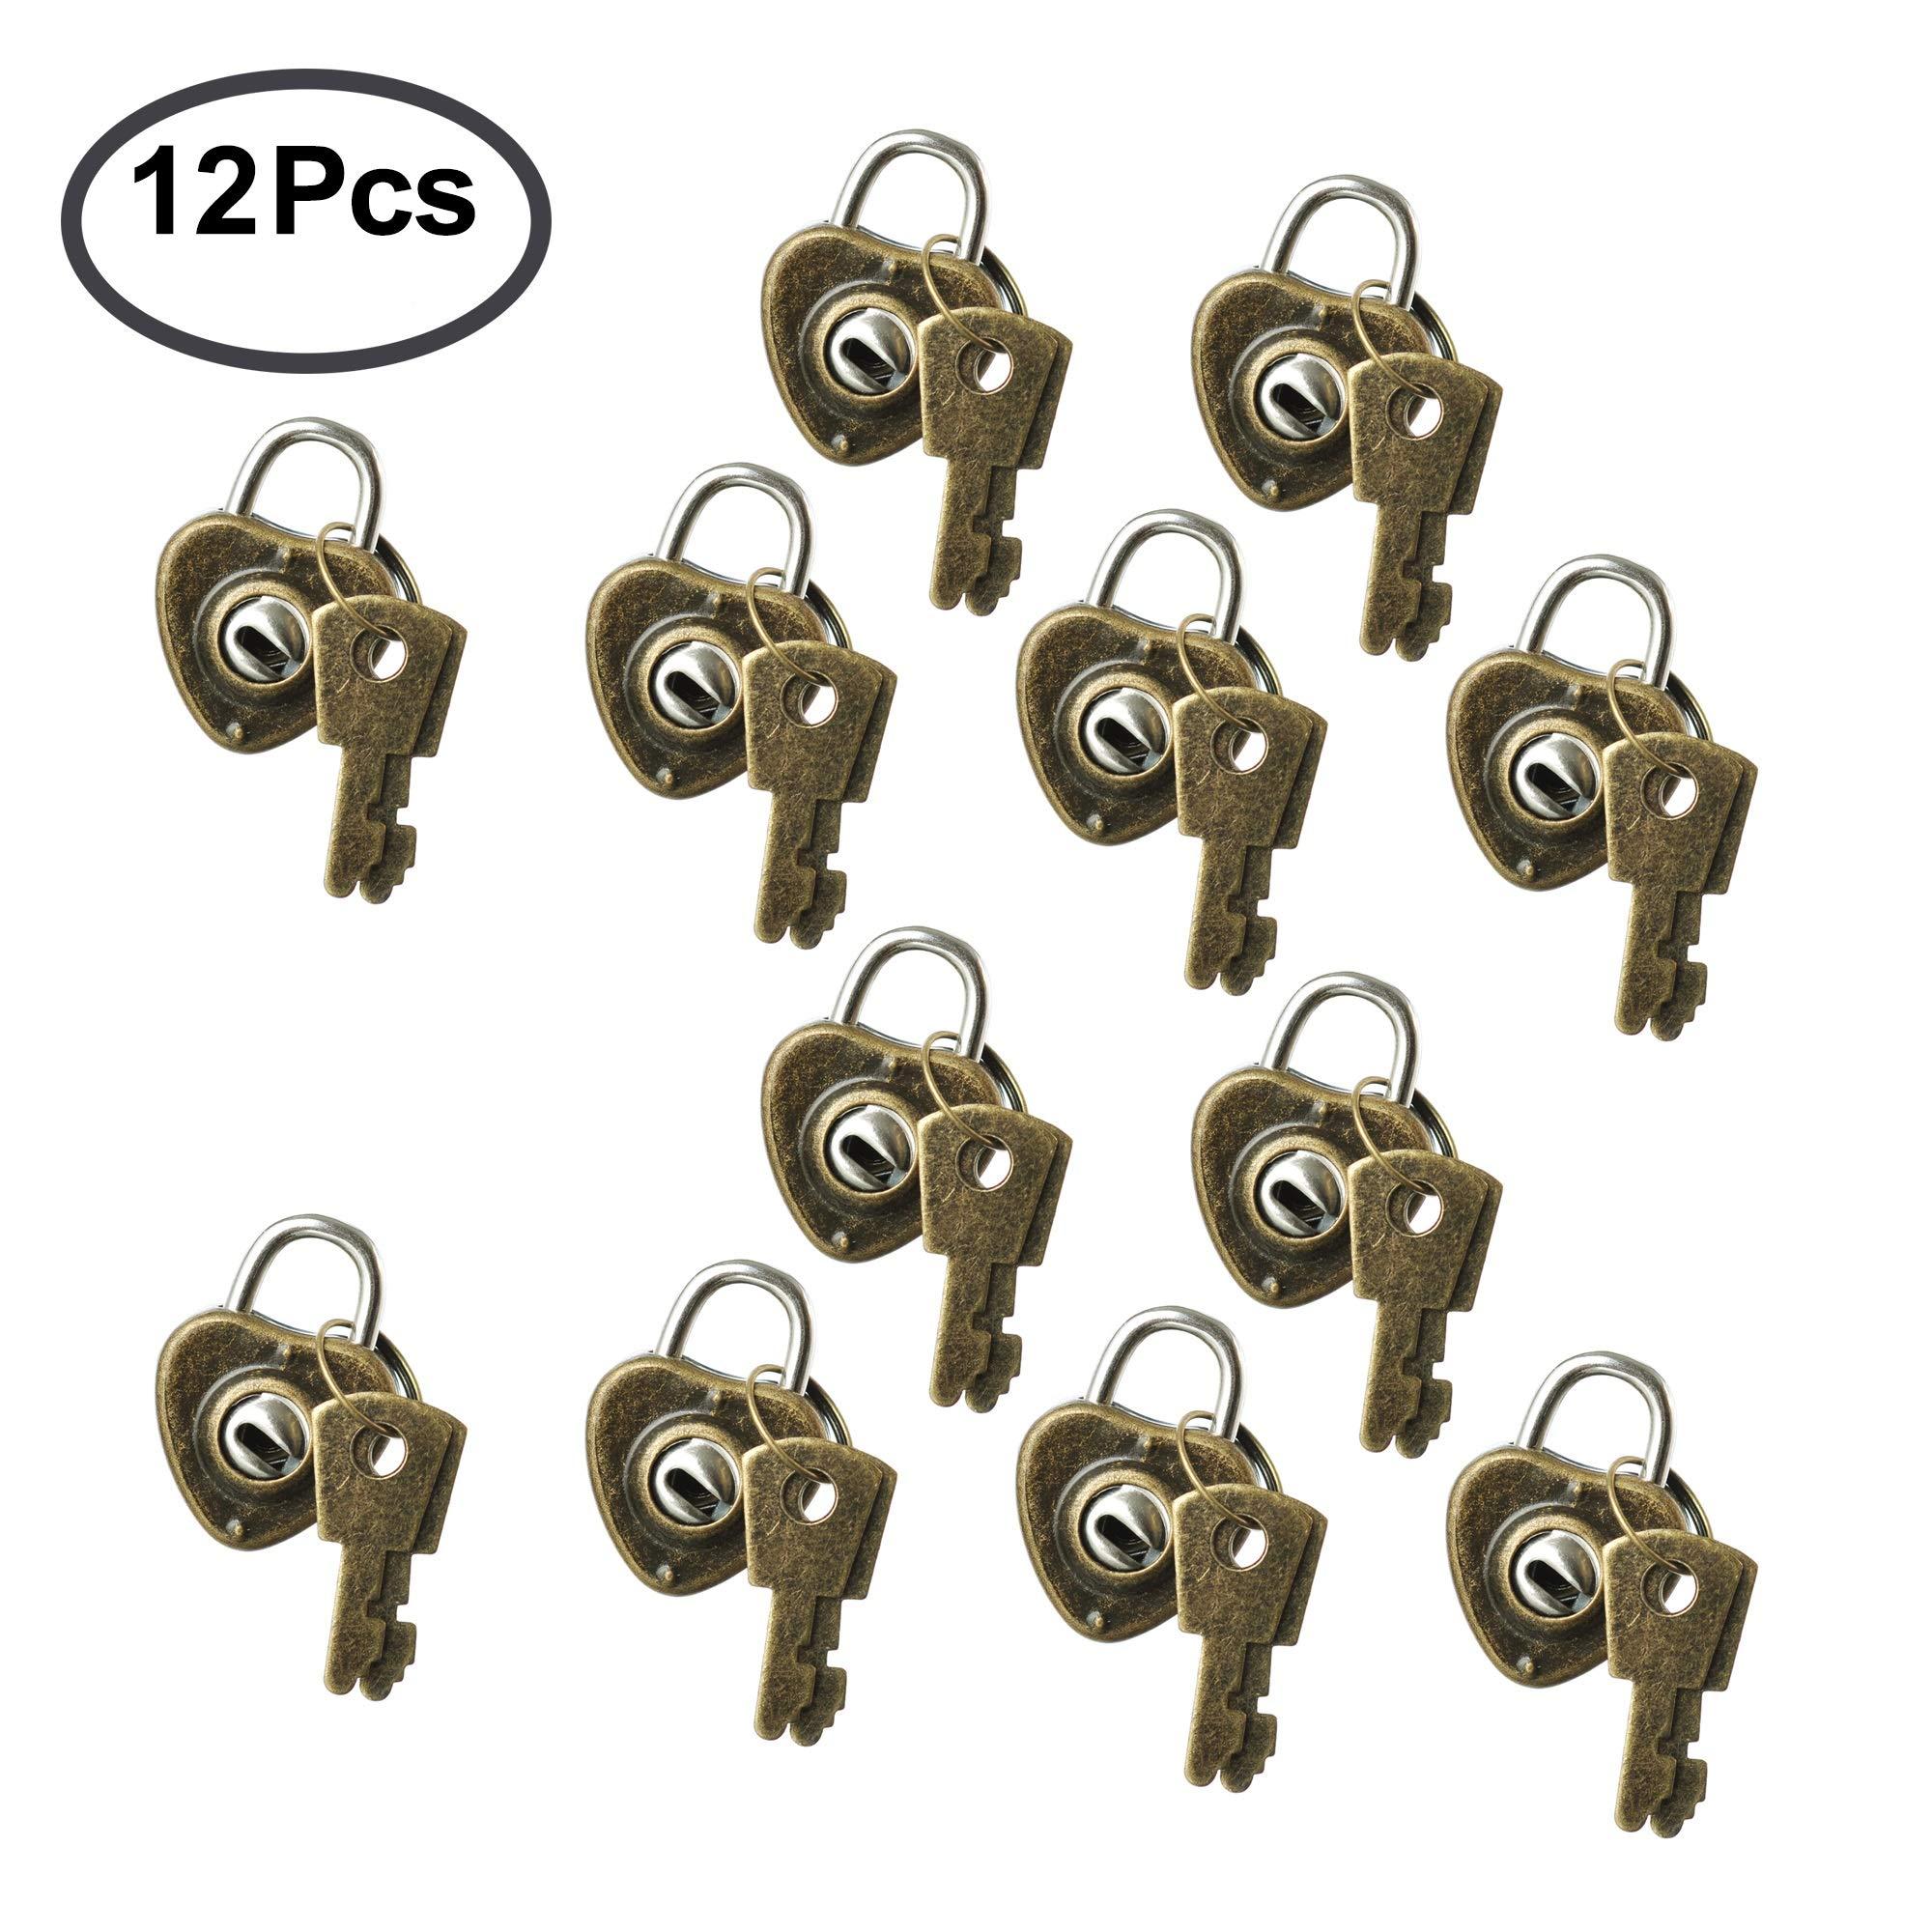 TTBD Mini Bronze Heart Lock, 12Pcs Vintage Heart Shaped Padlocks Key Locks Included 24 Keys by TTBD